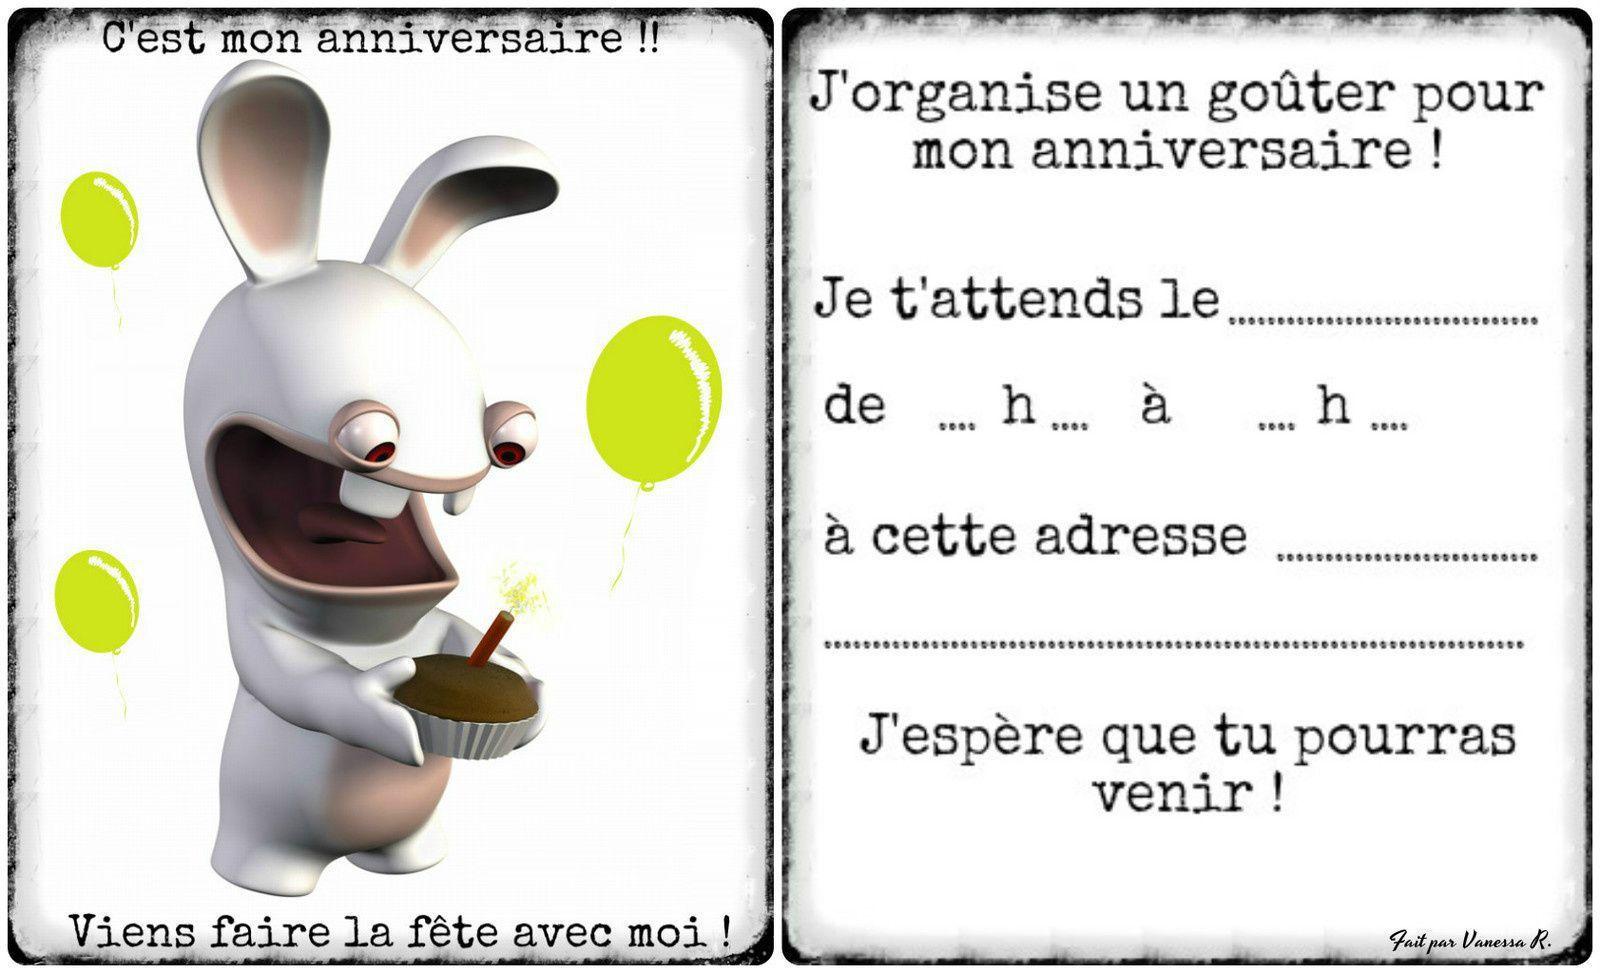 carte invitation anniversaire adulte gratuite   carte d'invitation   Invitations, Birthday ...